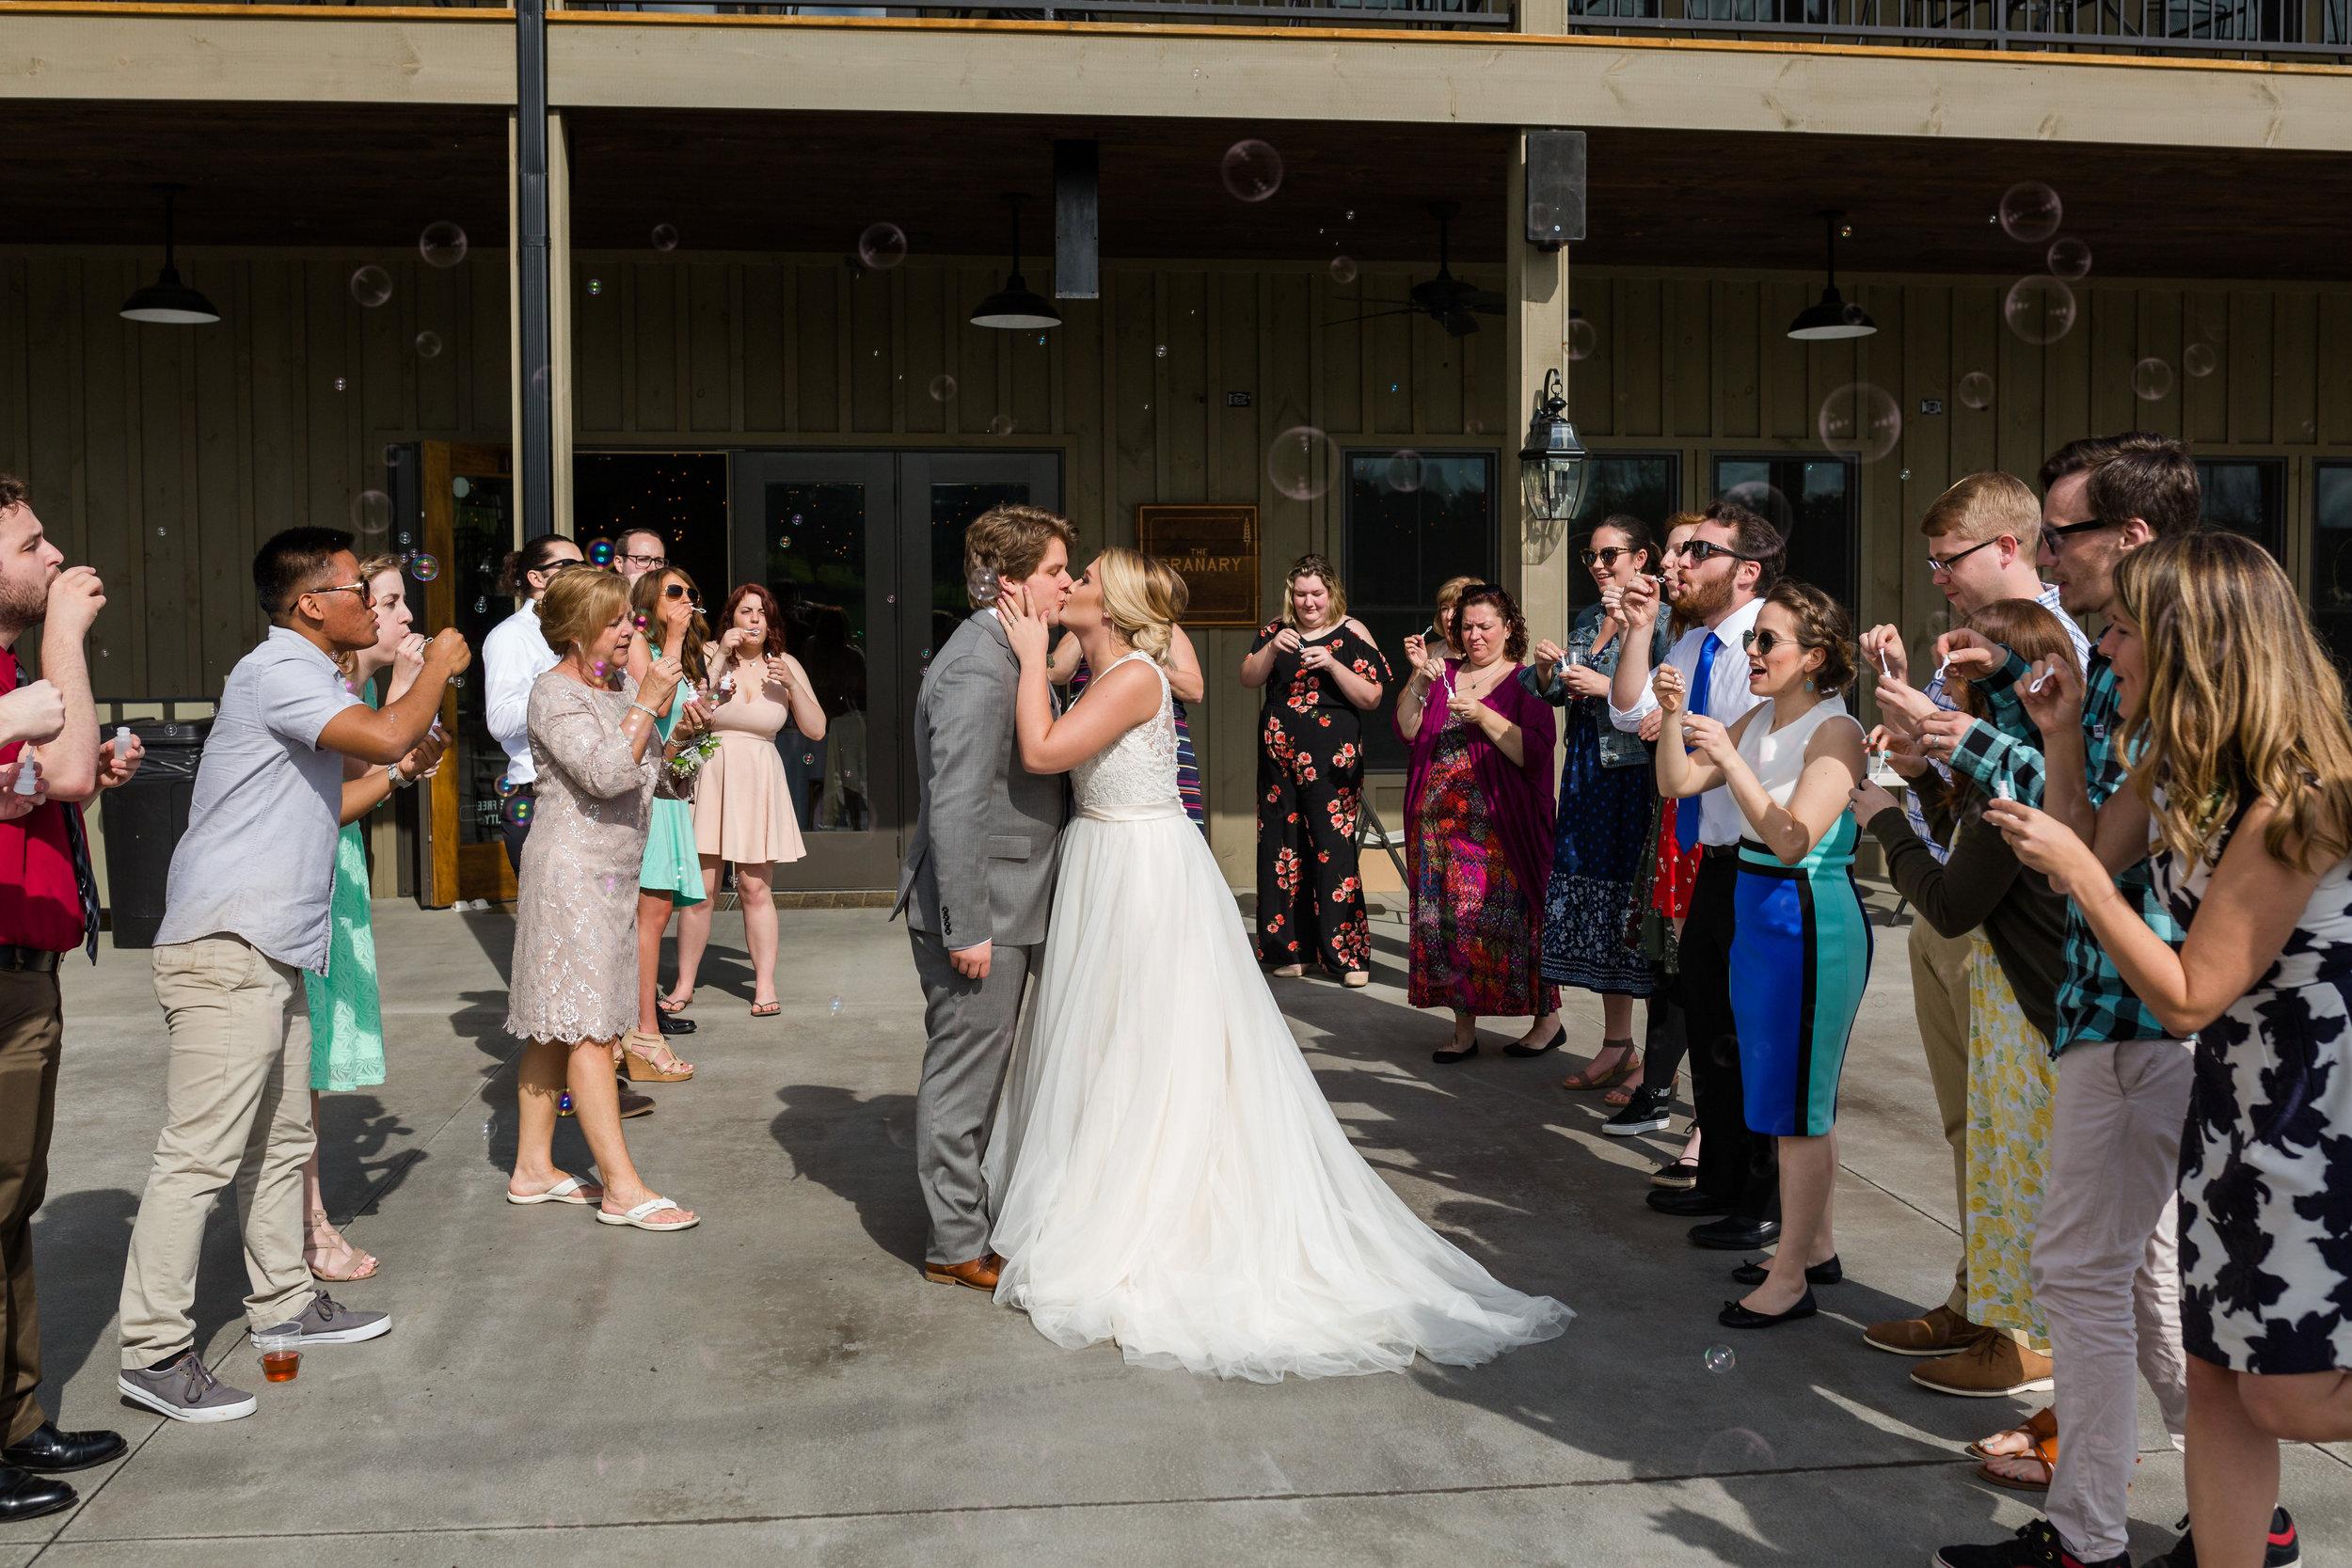 wedding the granary141.jpg